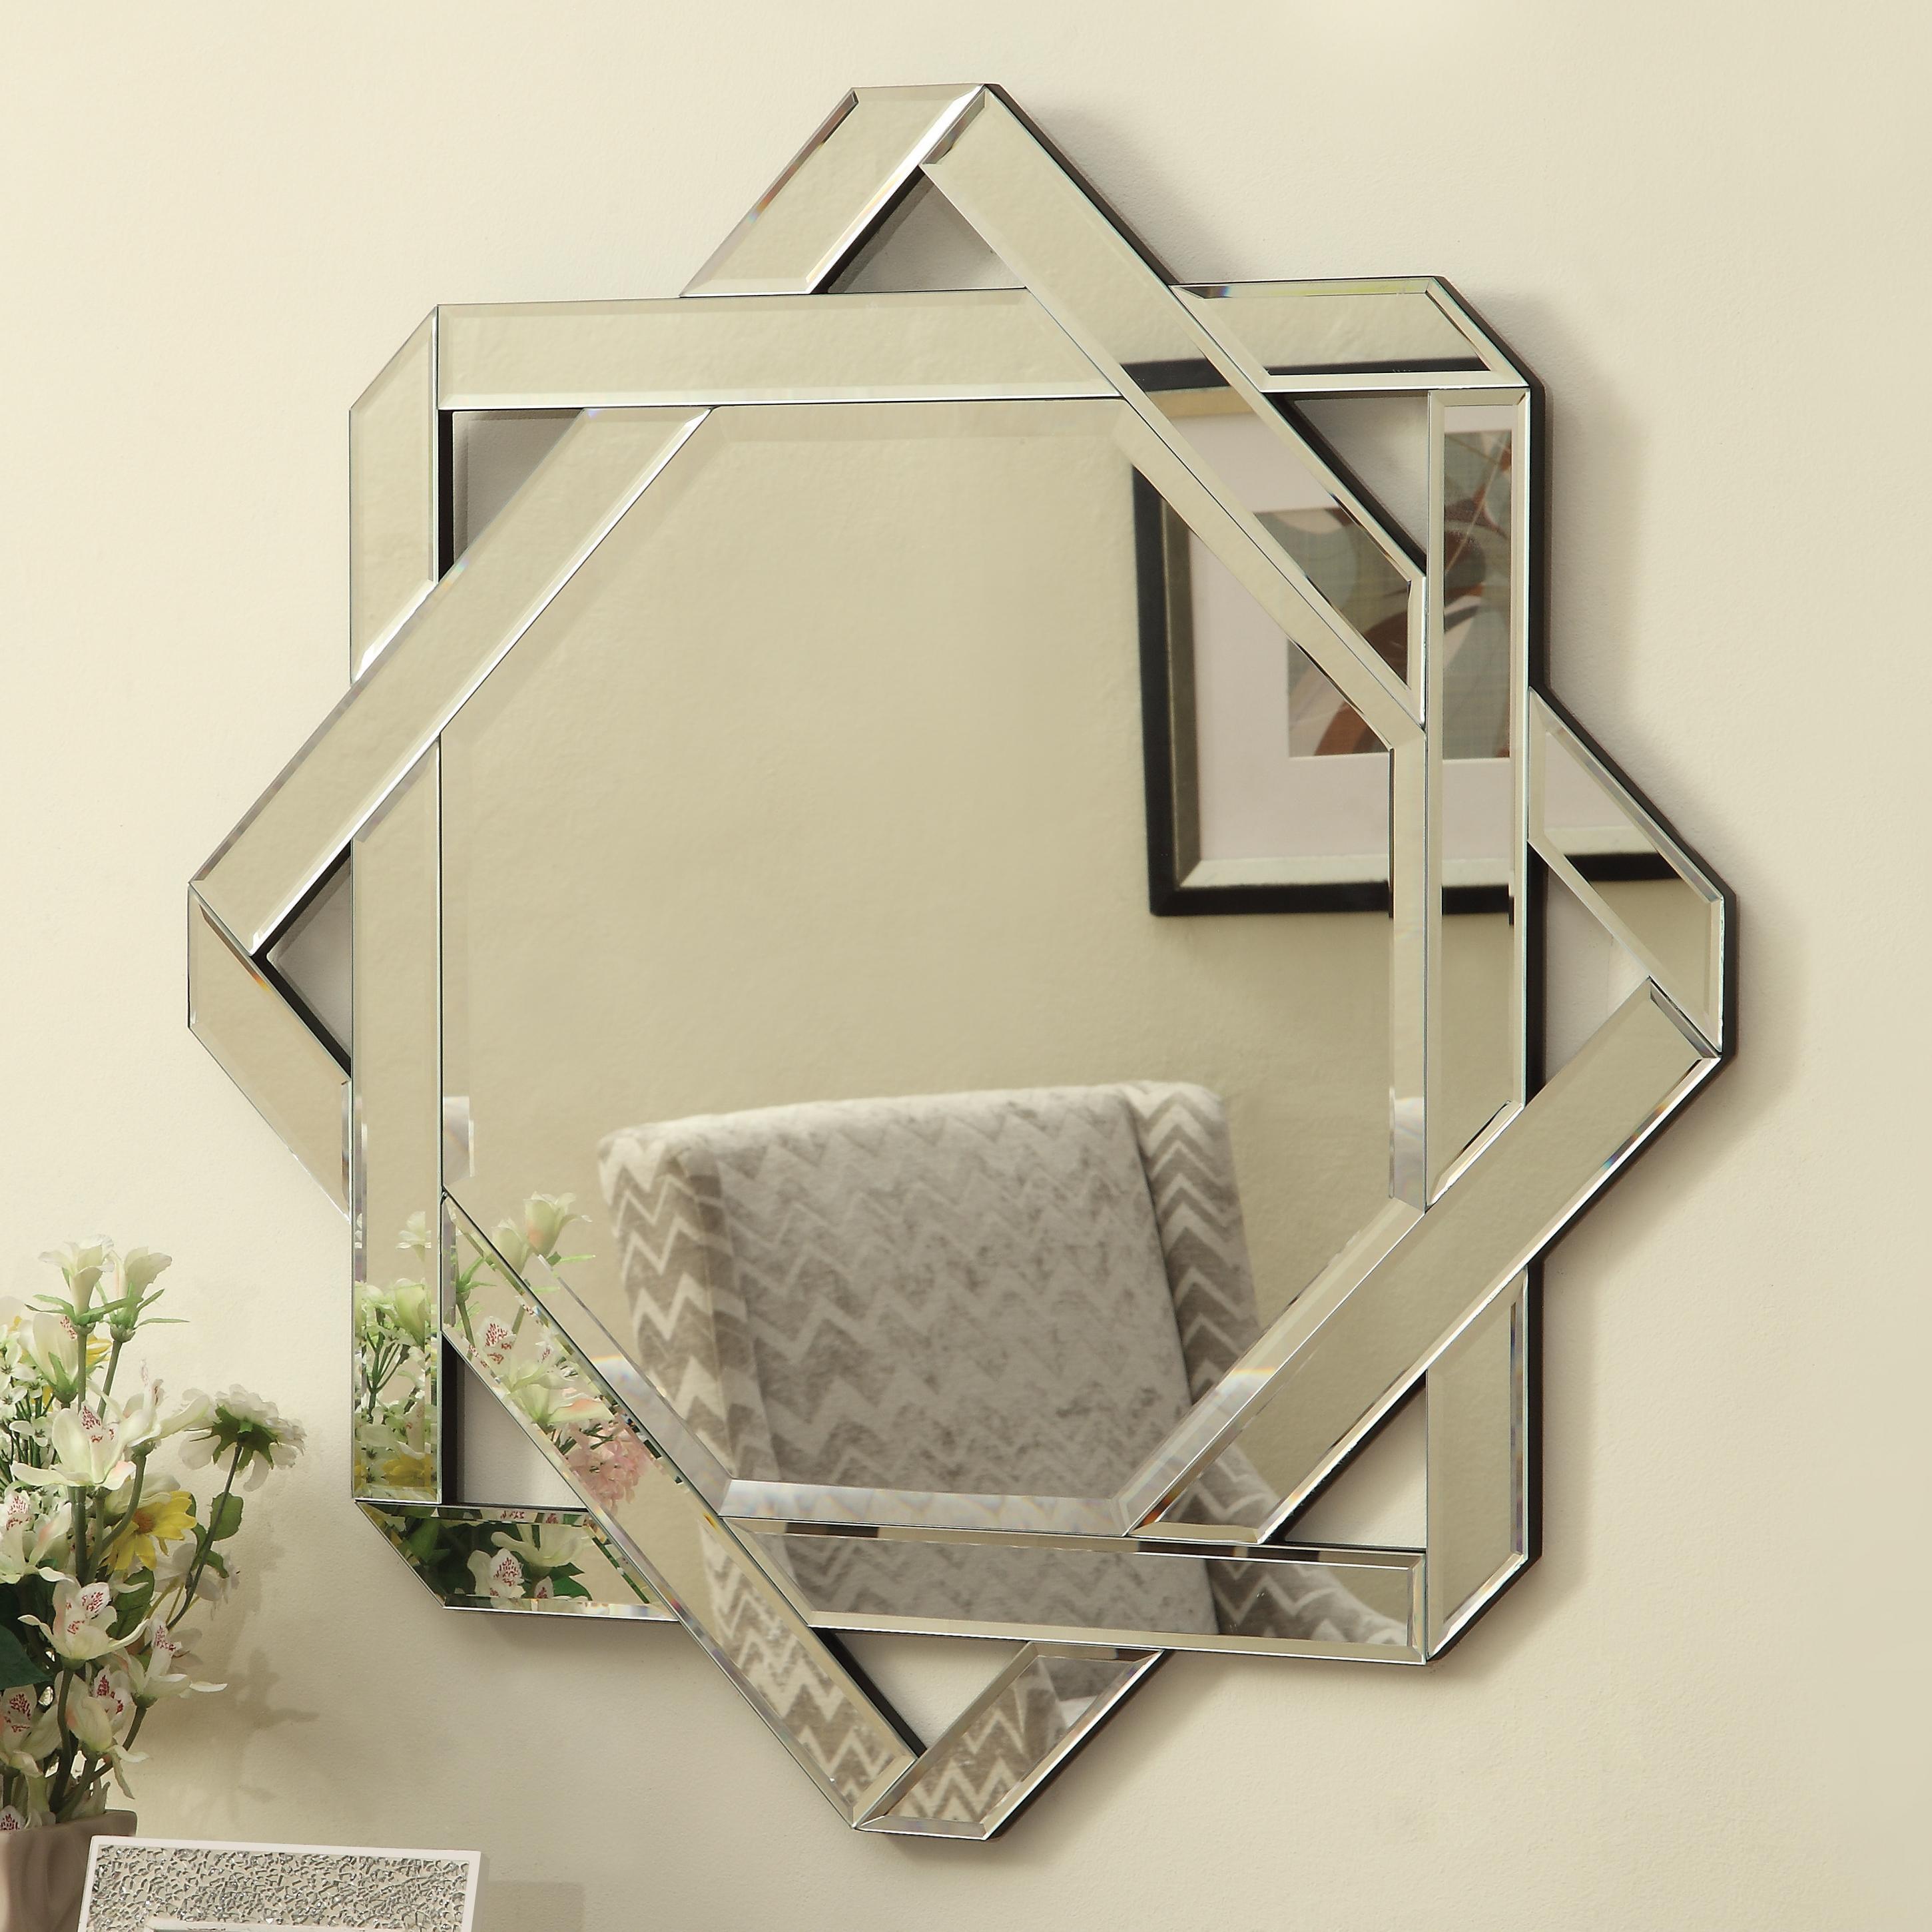 Accent Mirrors Star Shaped Wall Mirror Quality furniture  : Accent Mirrors901812 b0 from furniturewares.com size 2901 x 2901 jpeg 564kB